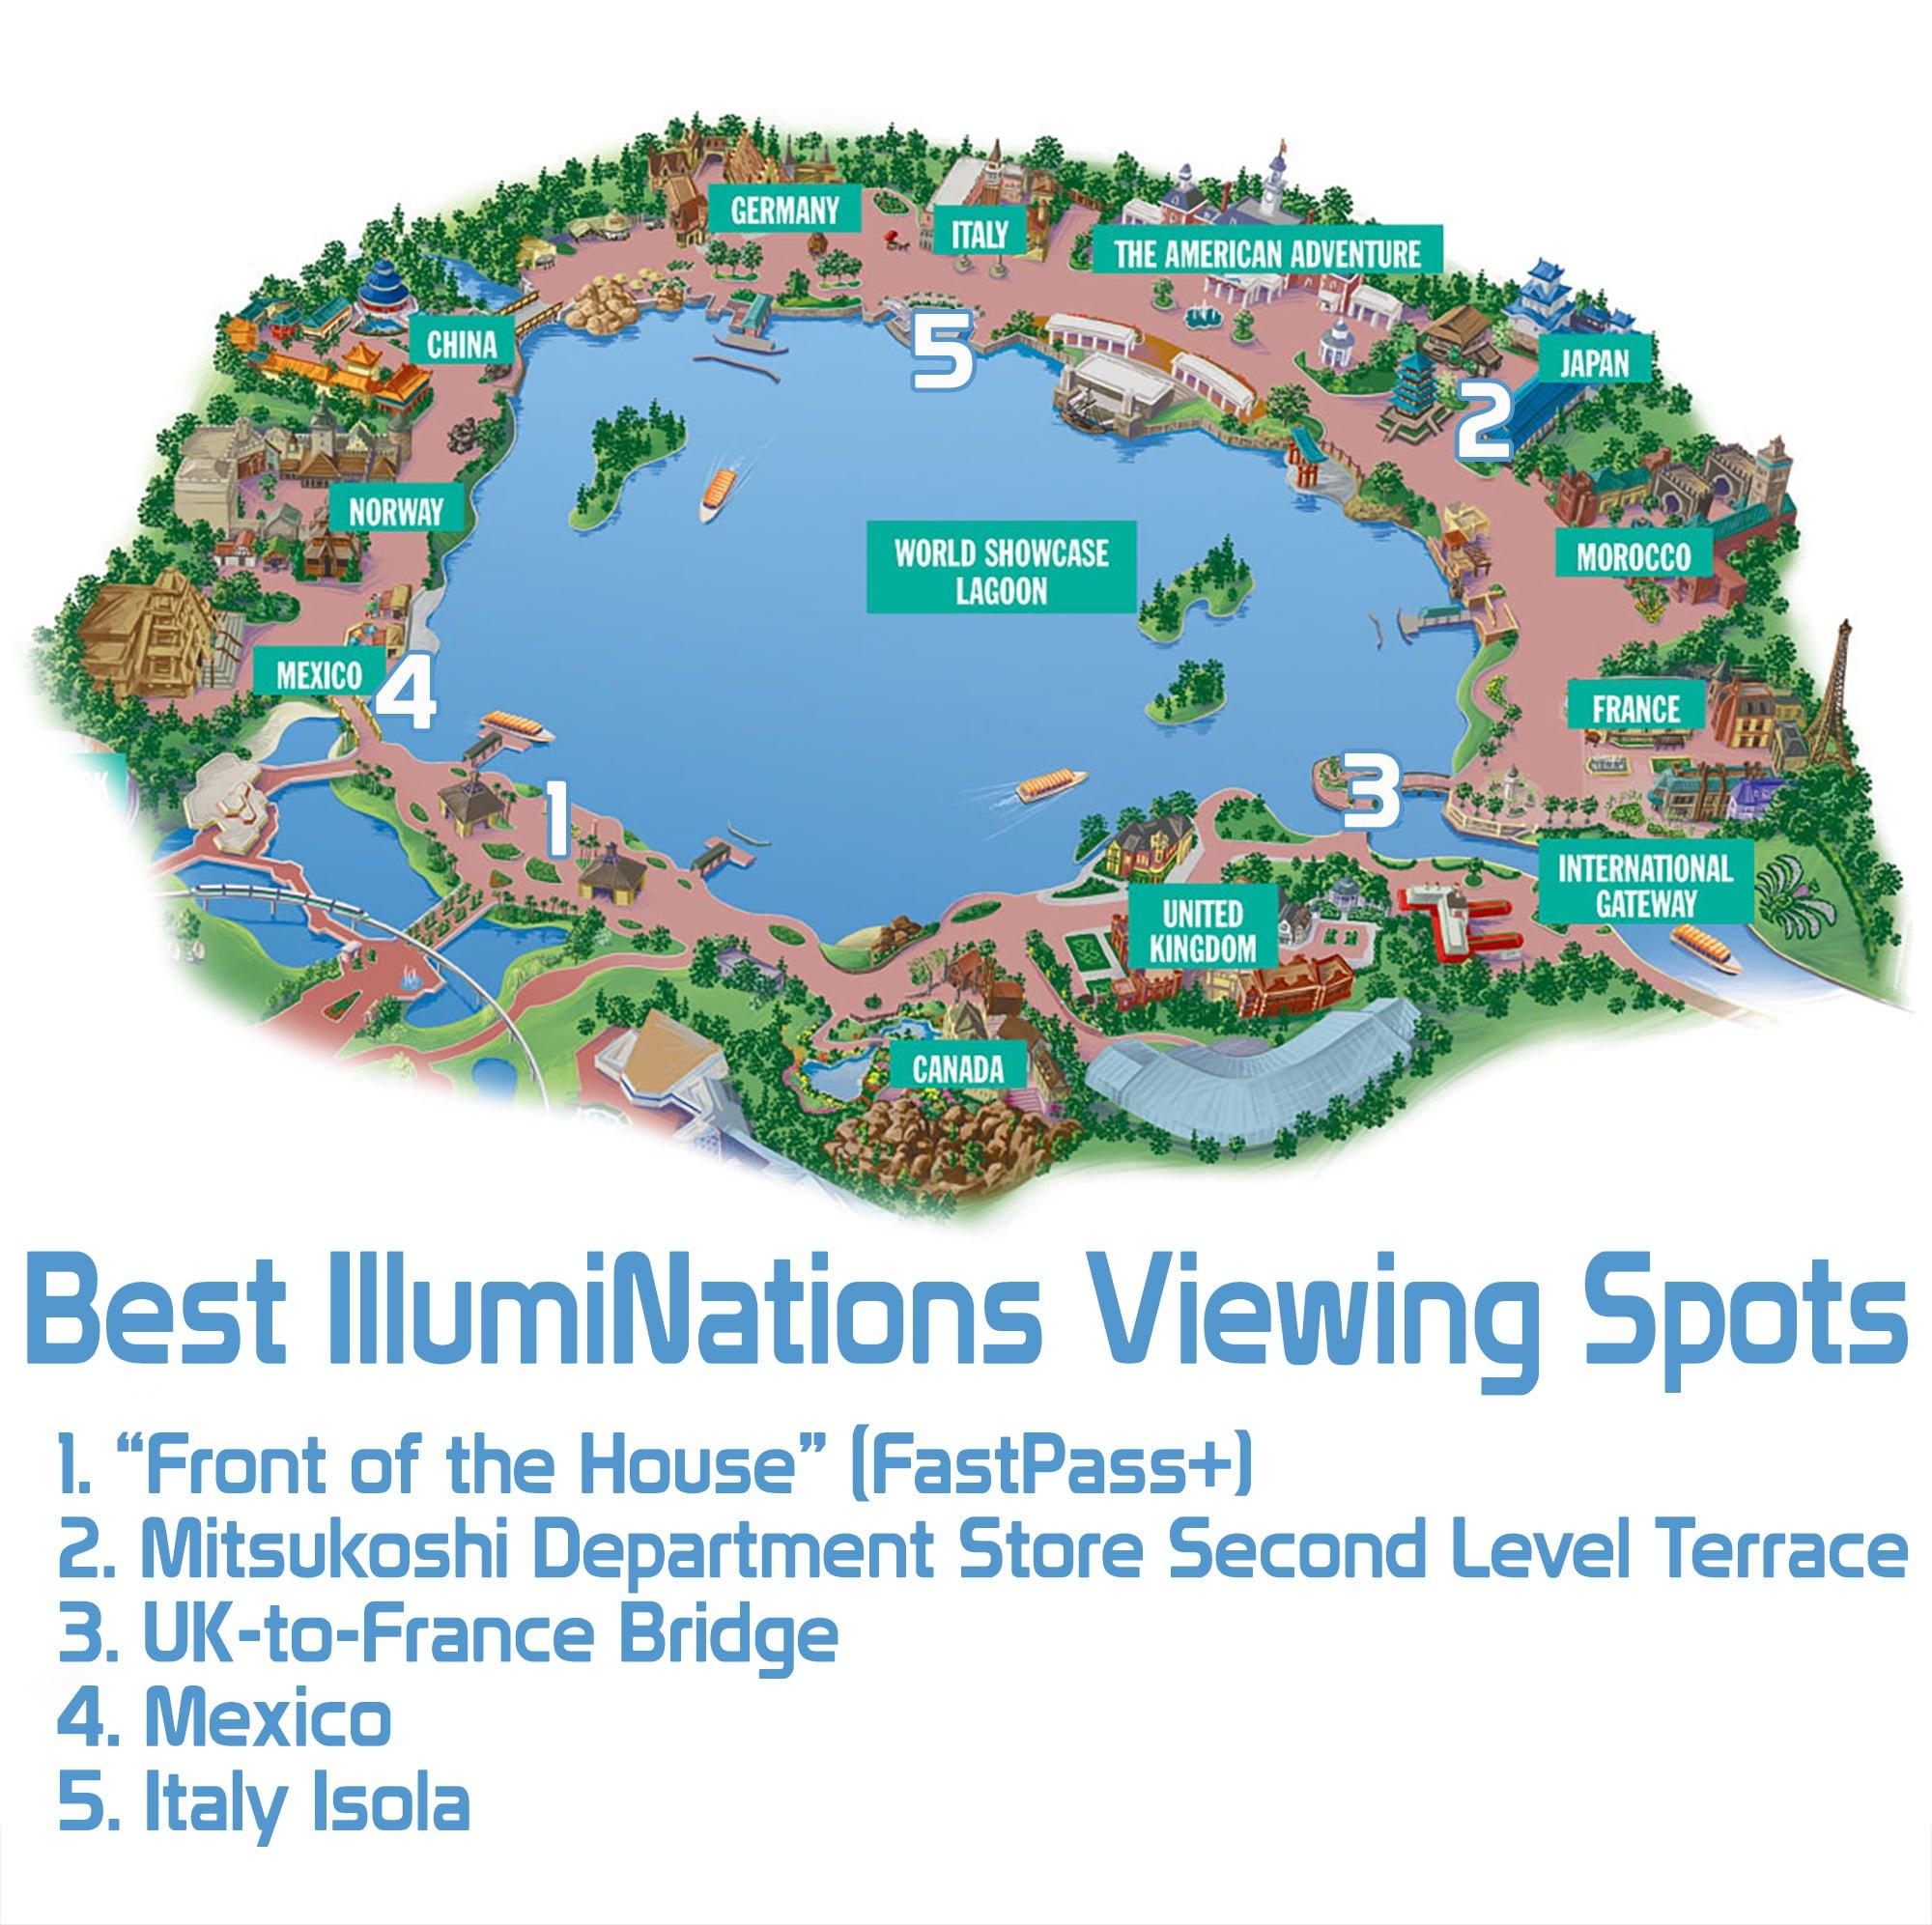 Best IllumiNations Viewing Spots - Disney Tourist Blog